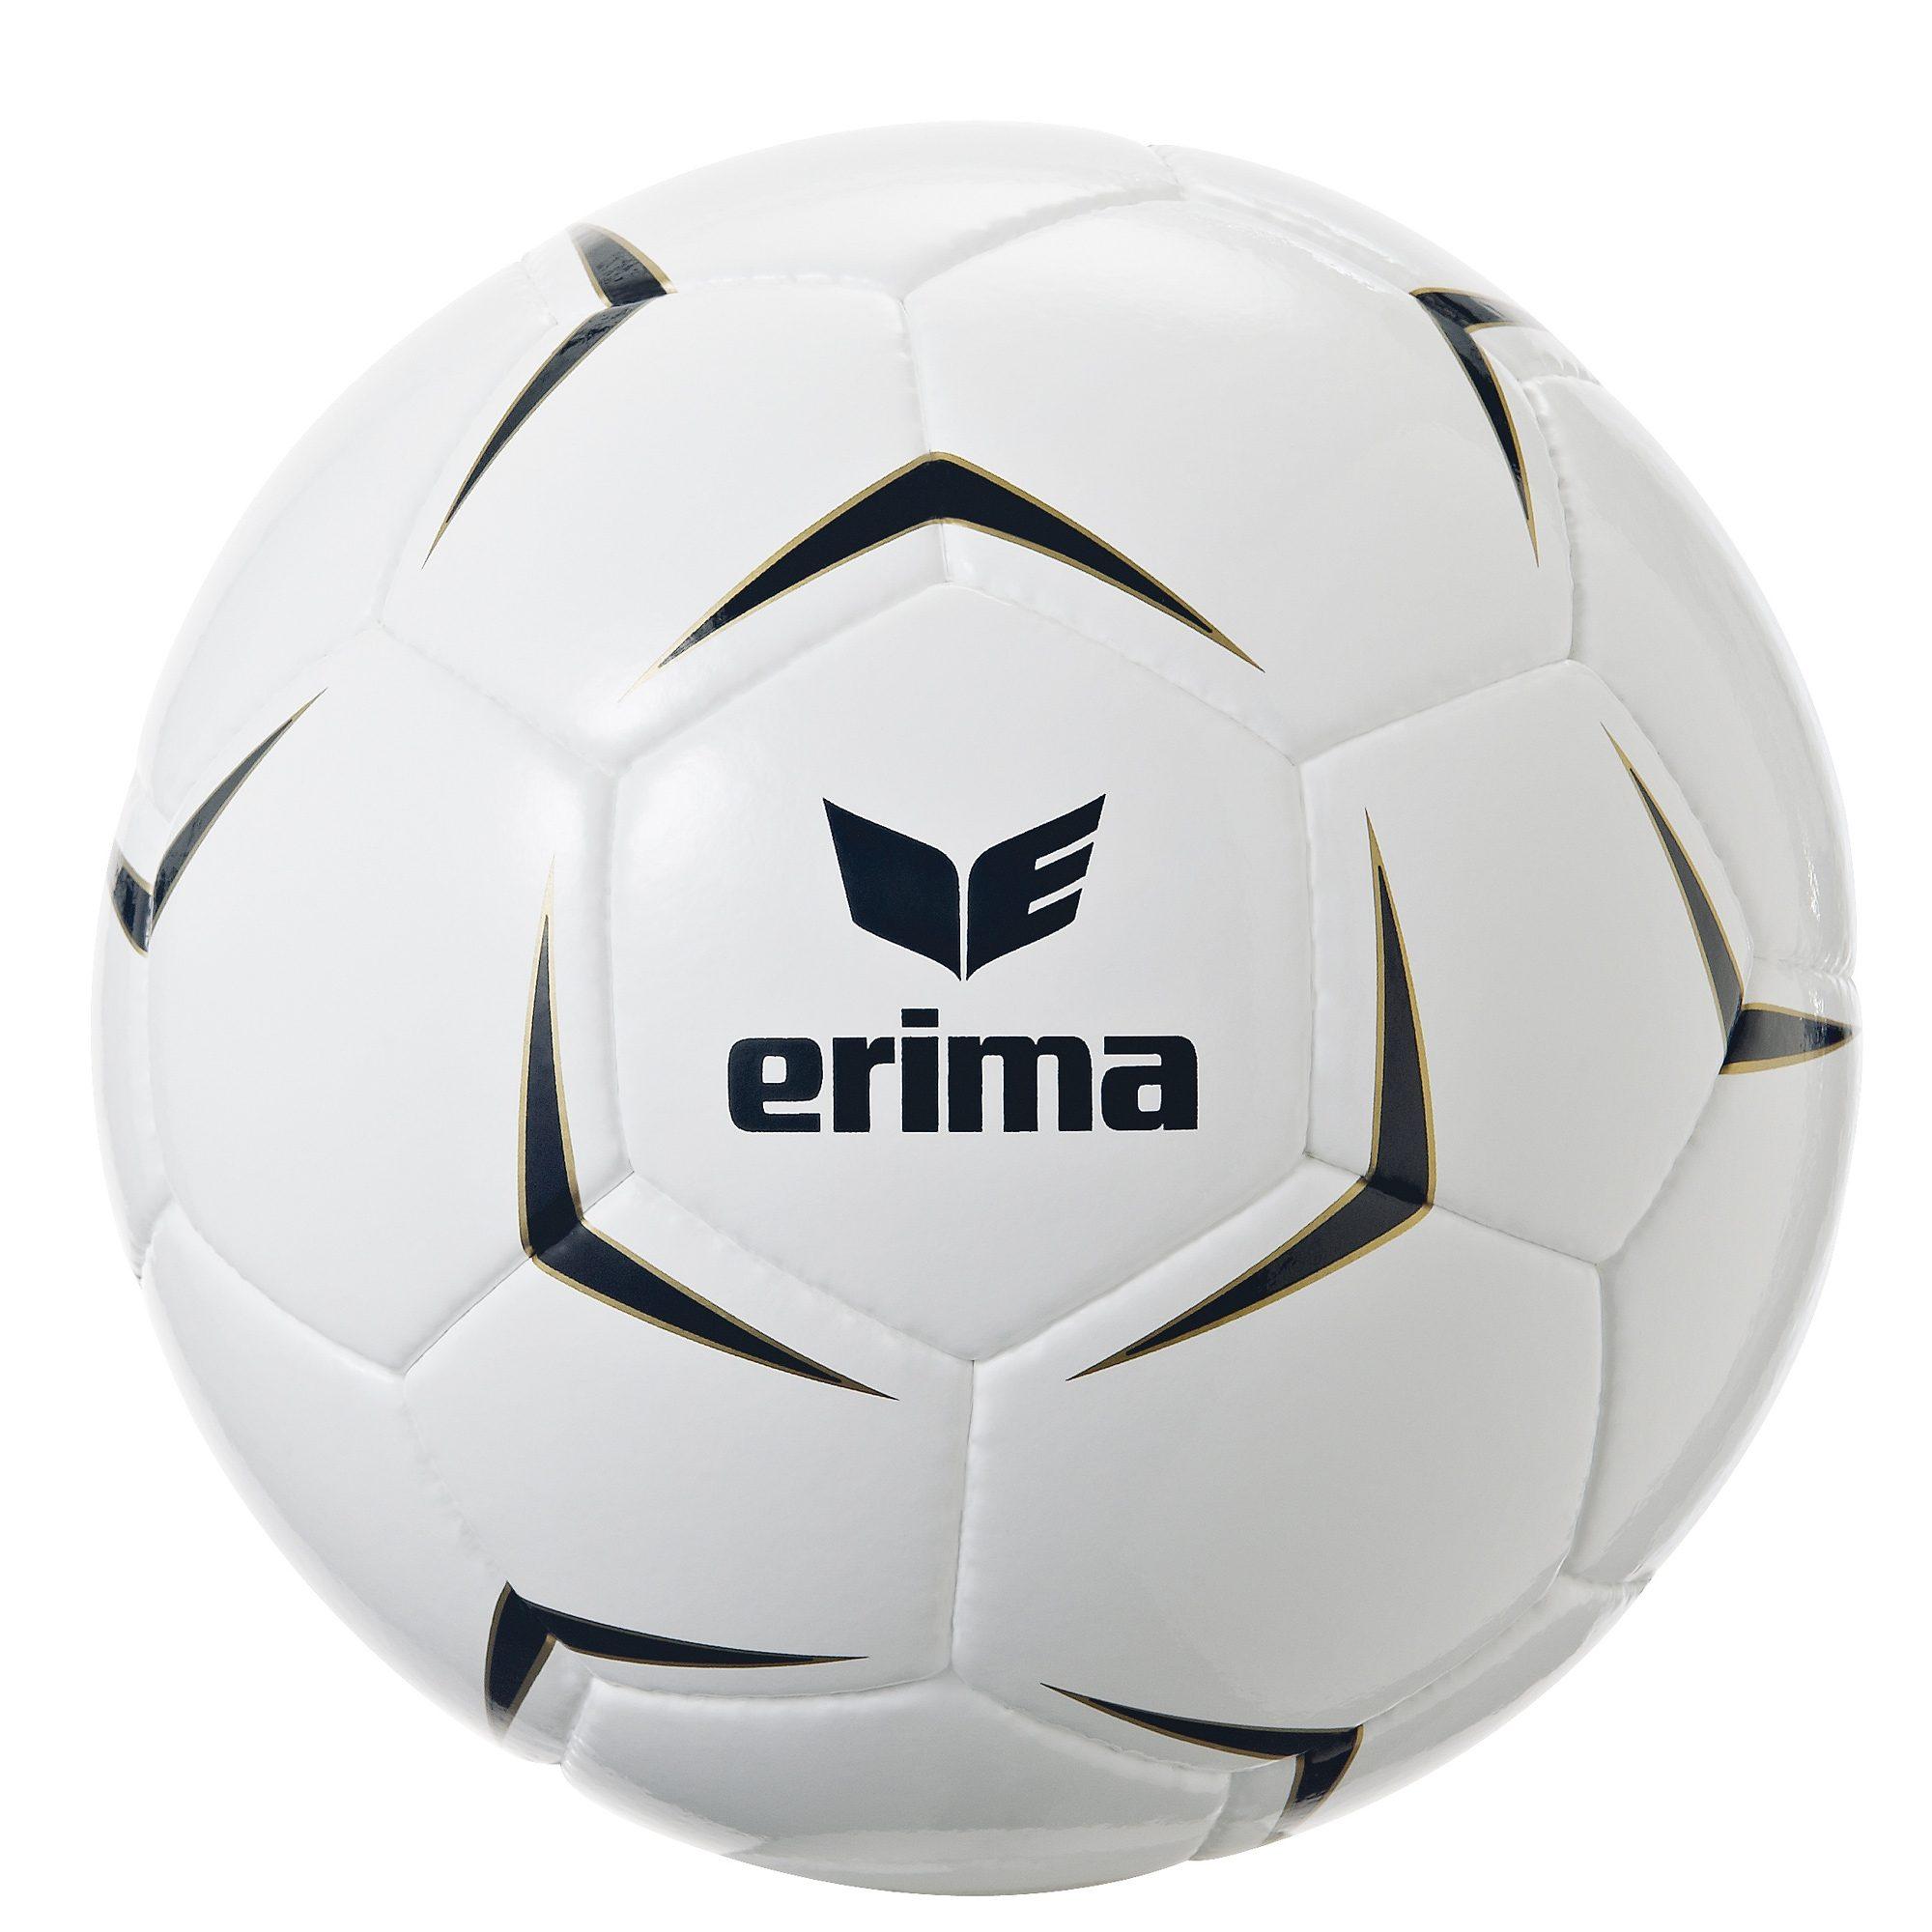 ERIMA Fußball Majestor Match Spielball